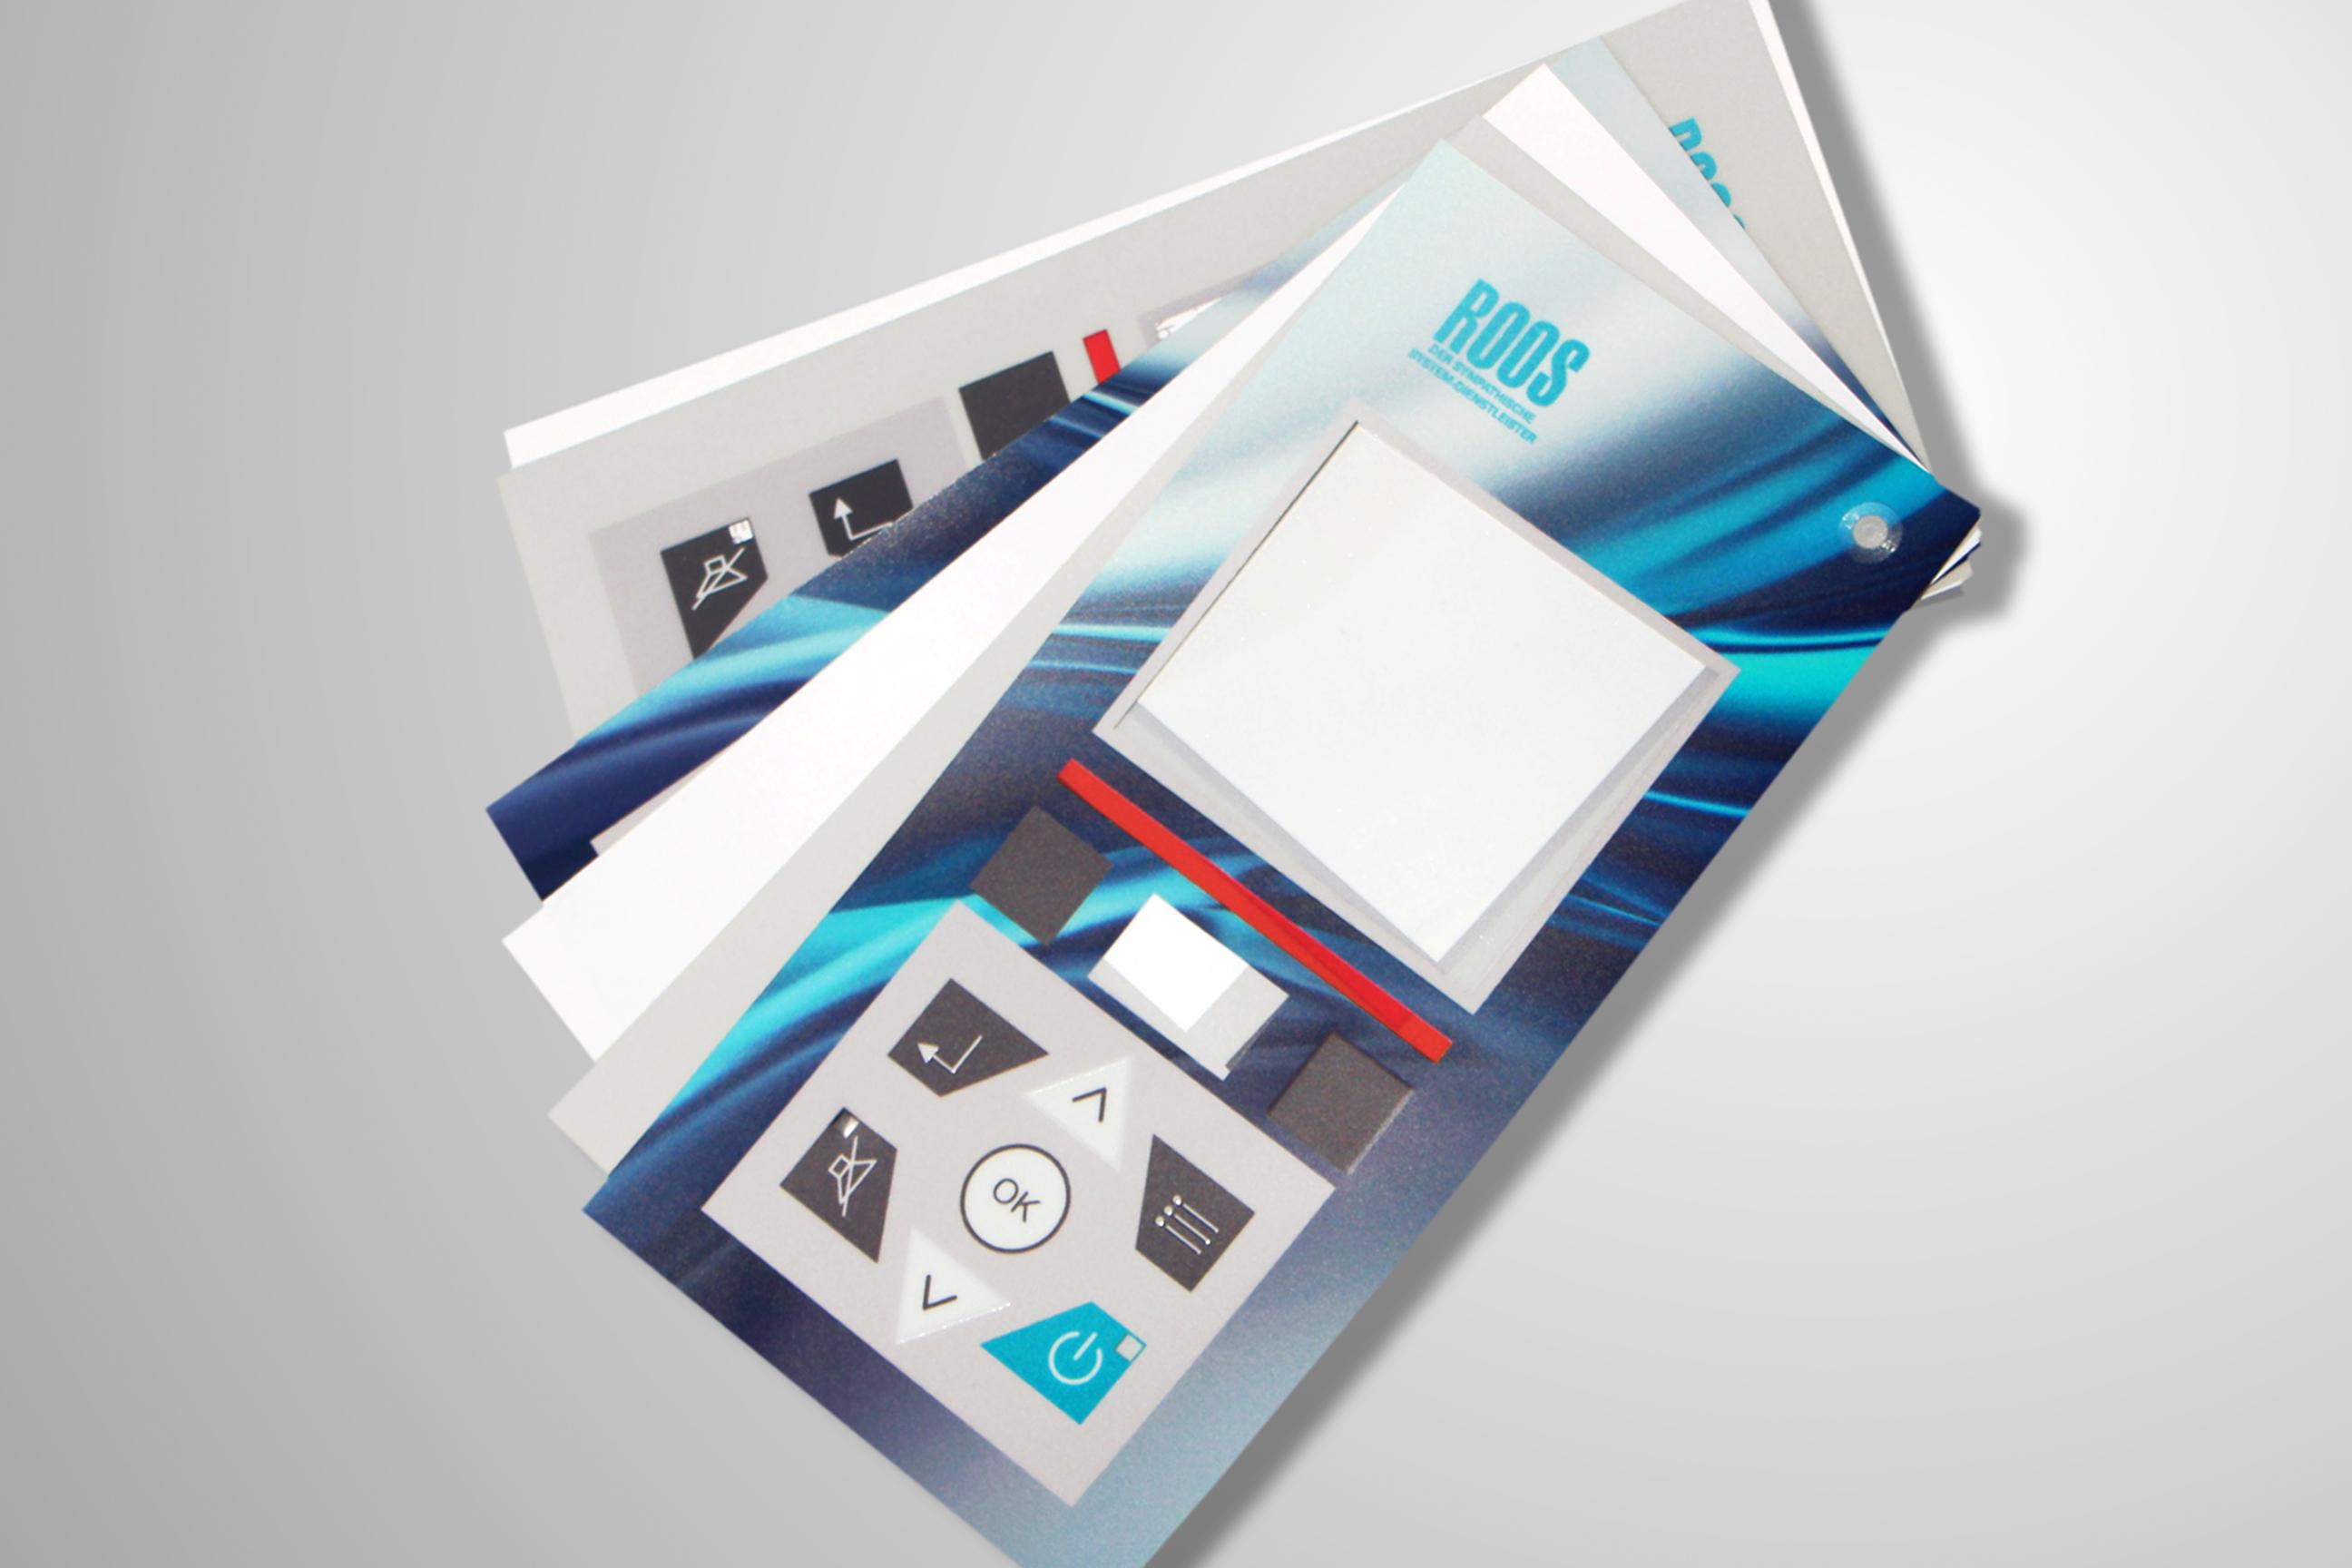 Frontfolien - Roos GmbH.jpg